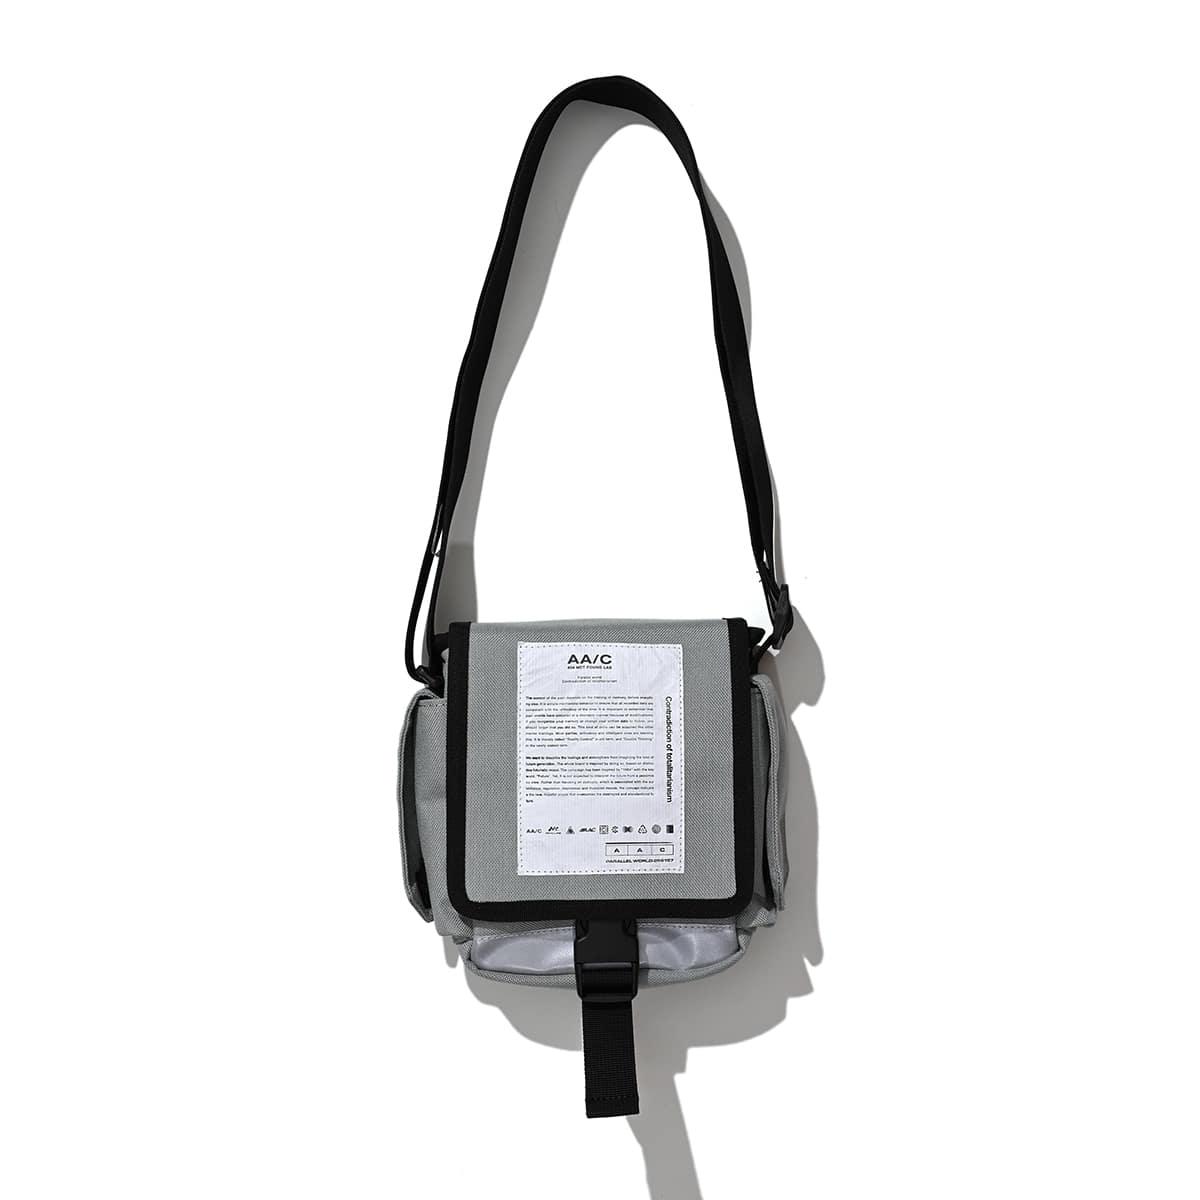 AA/C 3M Shot Bag (gray)